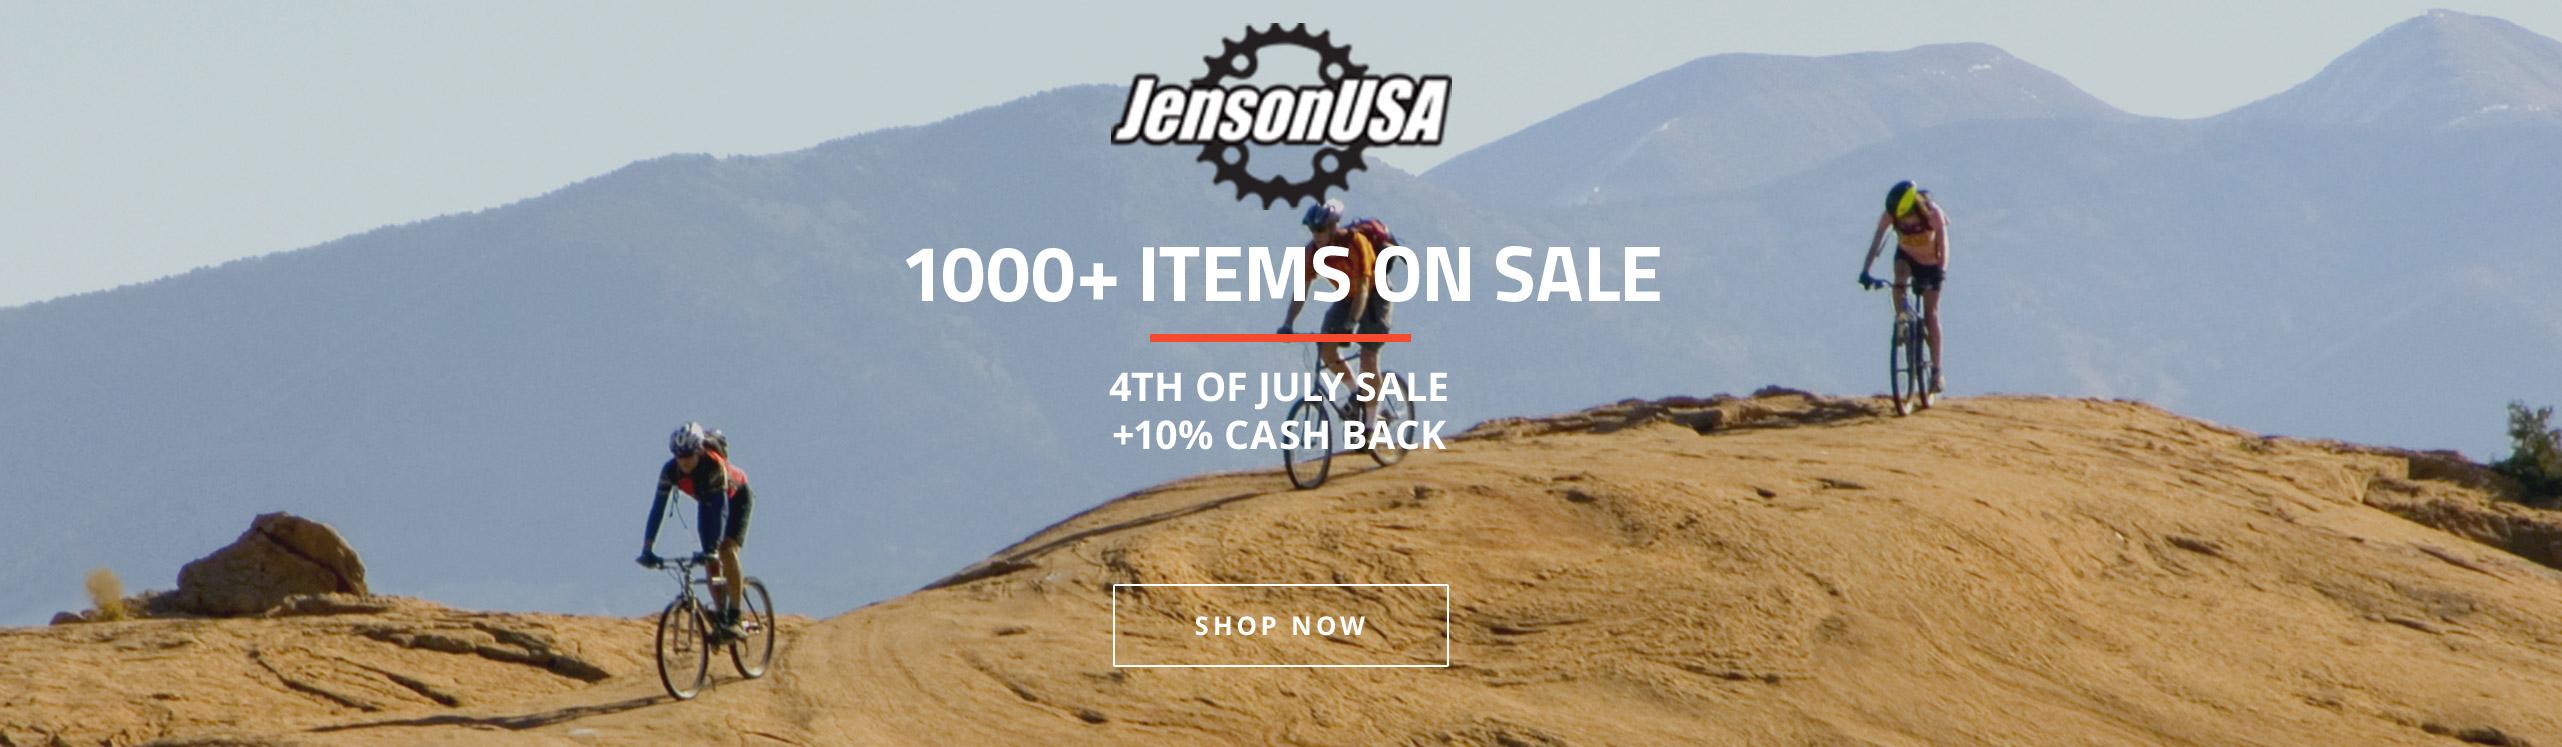 Jenson 4th of July